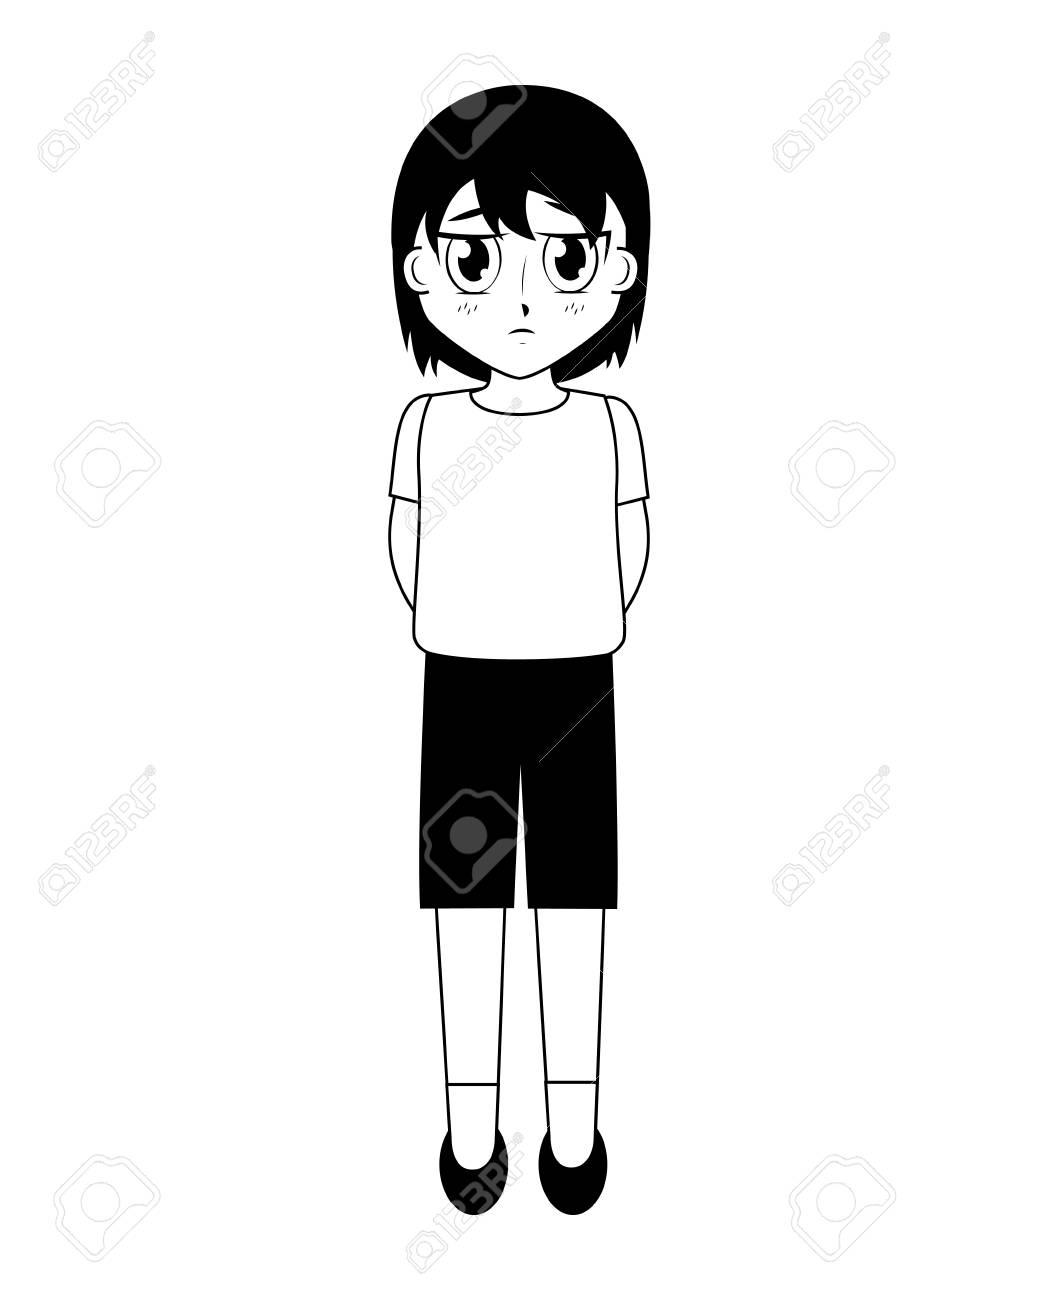 Anime boy manga character on white background vector illustration